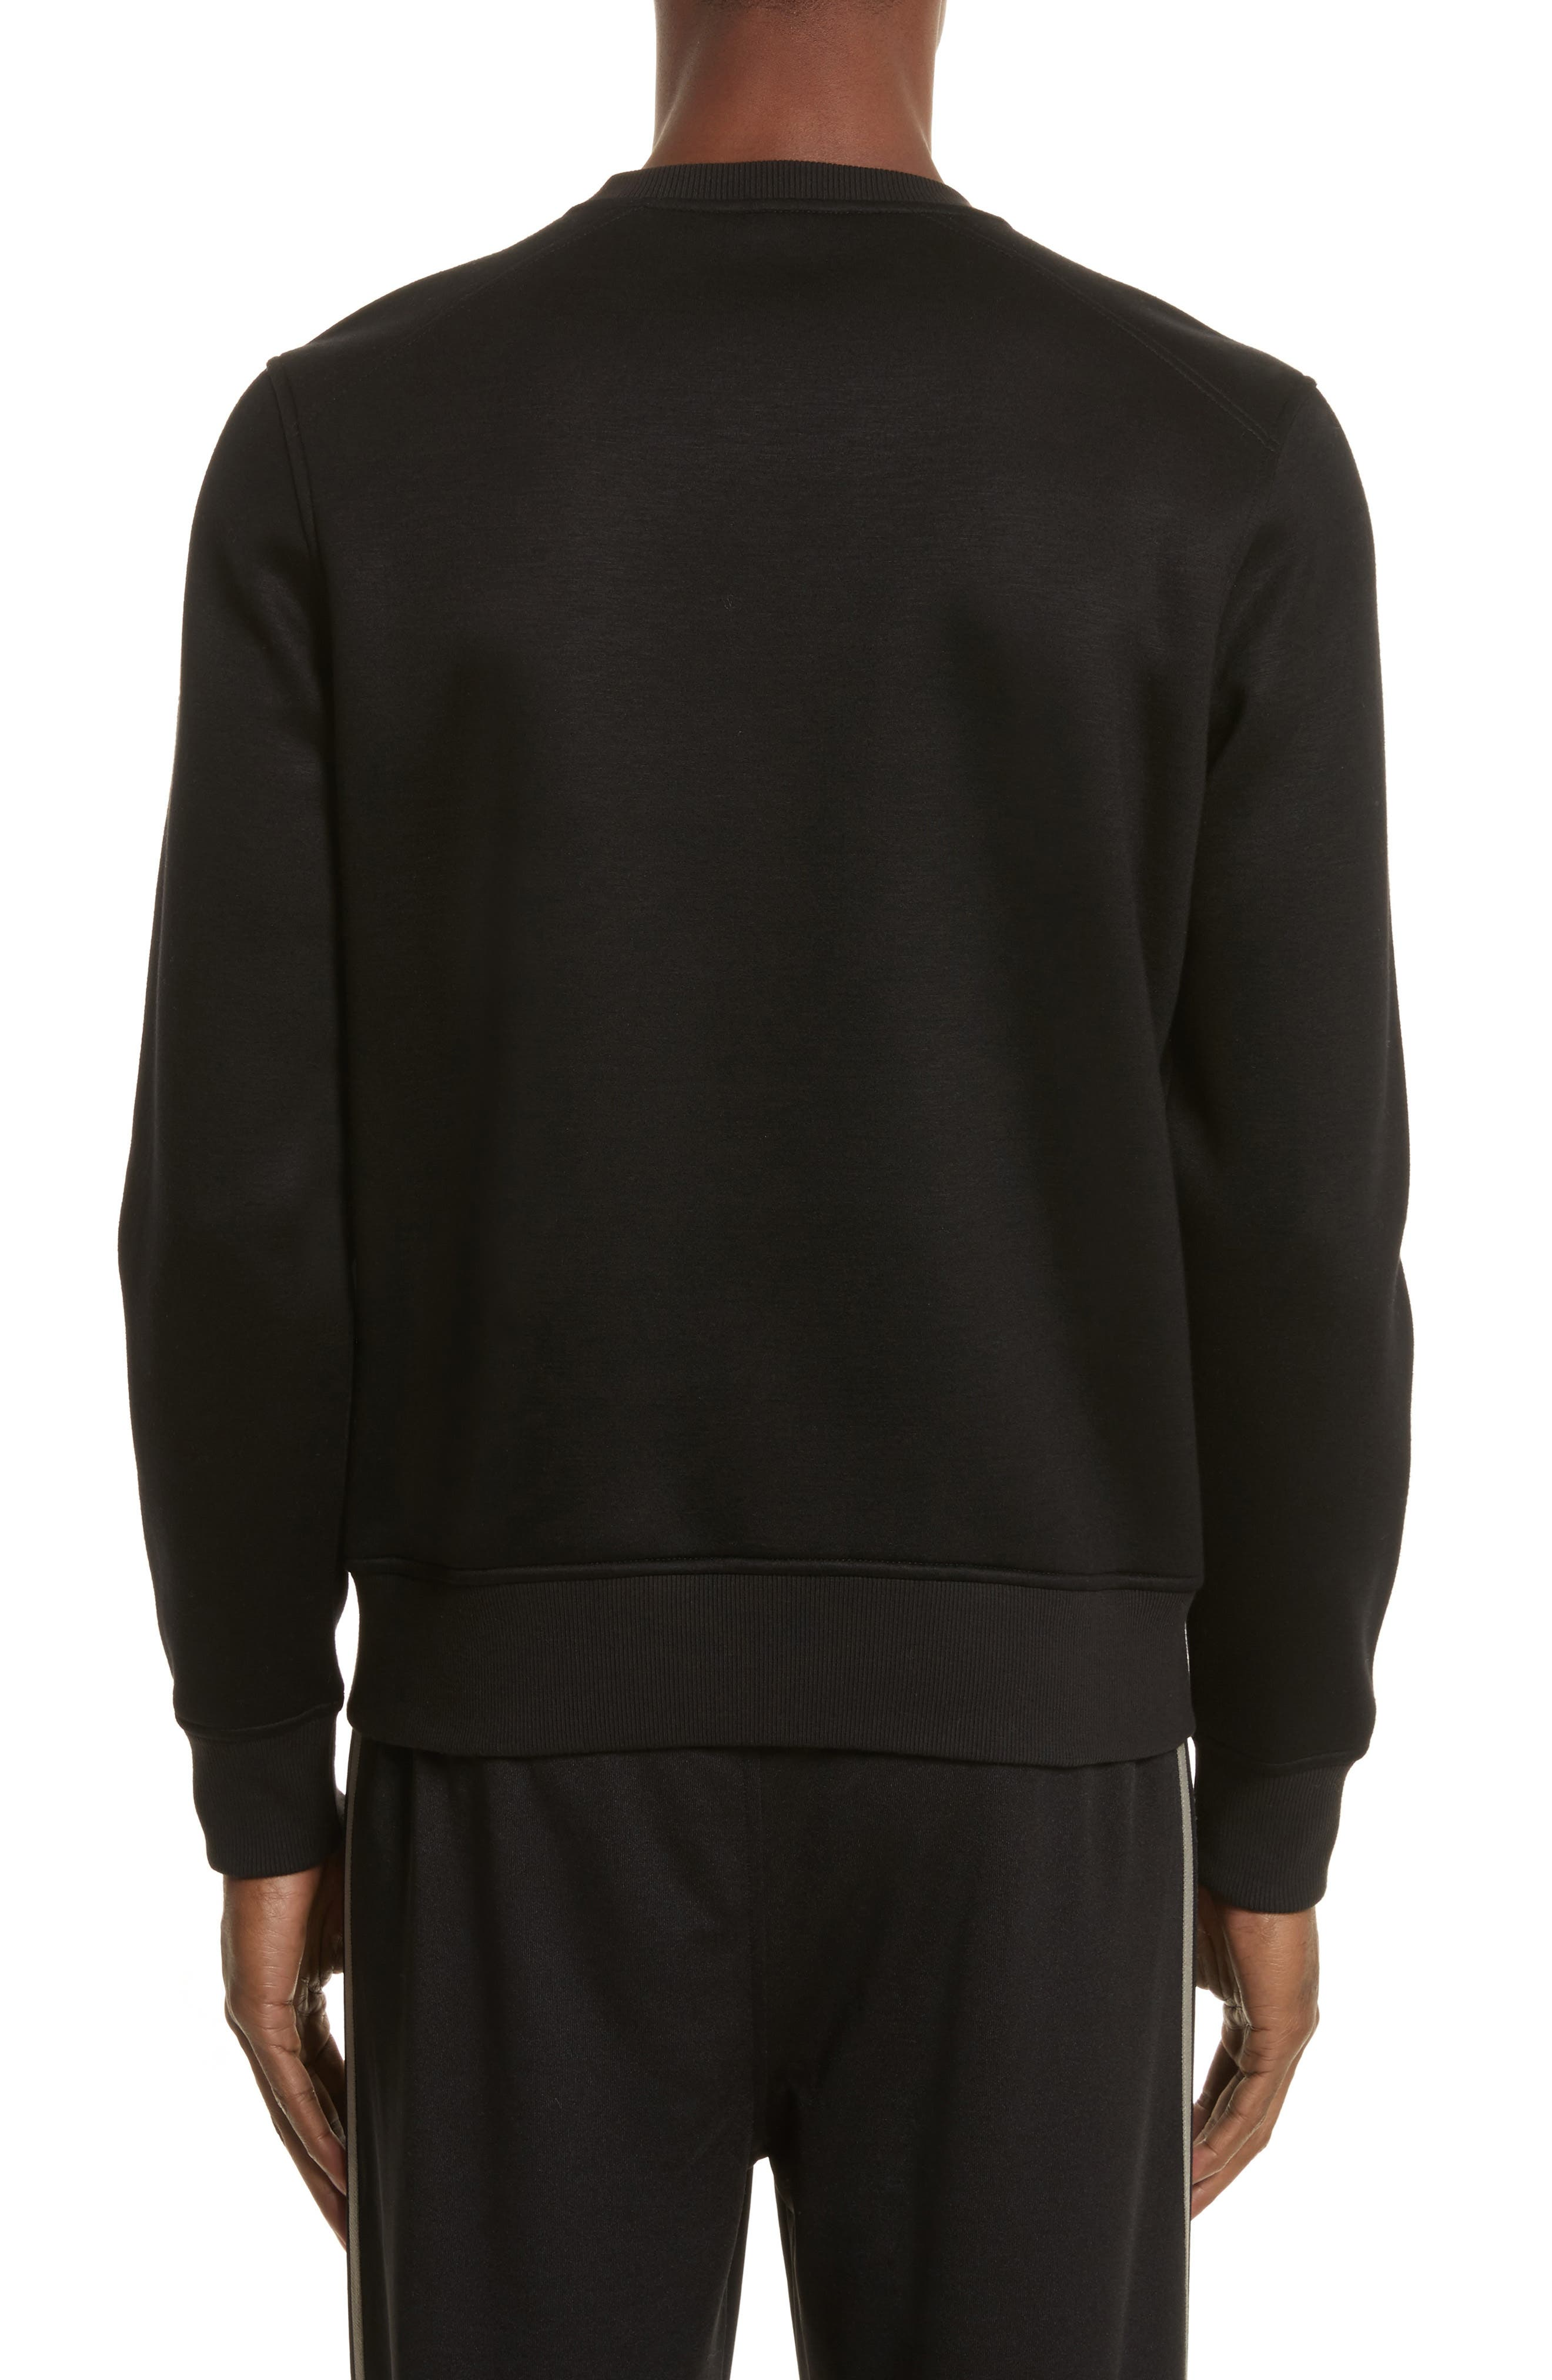 Belsford Crewneck Sweatshirt,                             Alternate thumbnail 2, color,                             001